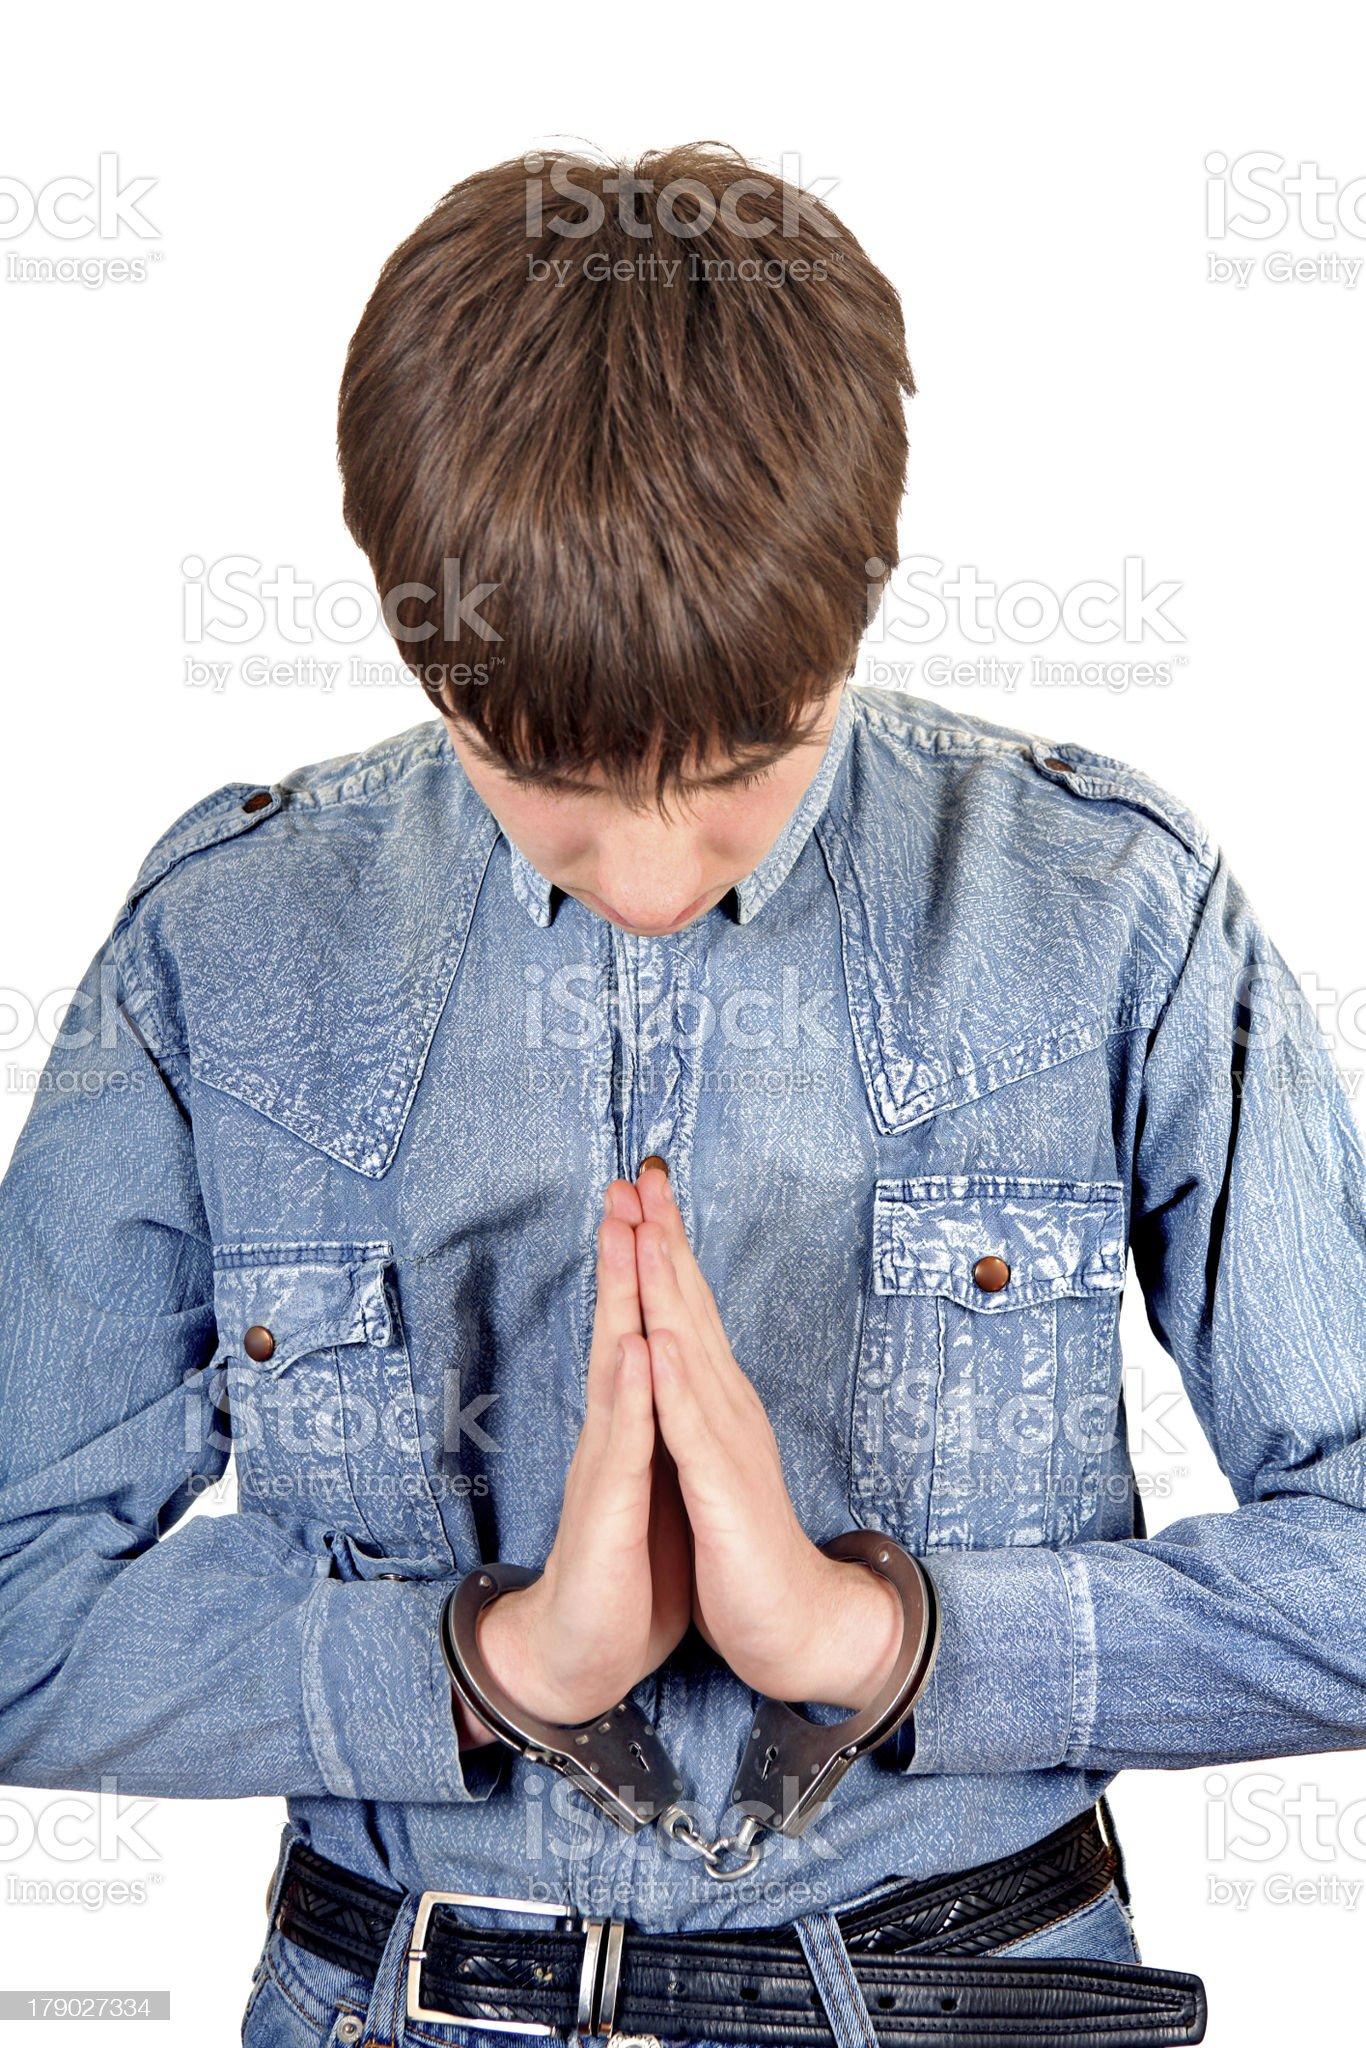 Praying Man in Handcuffs royalty-free stock photo